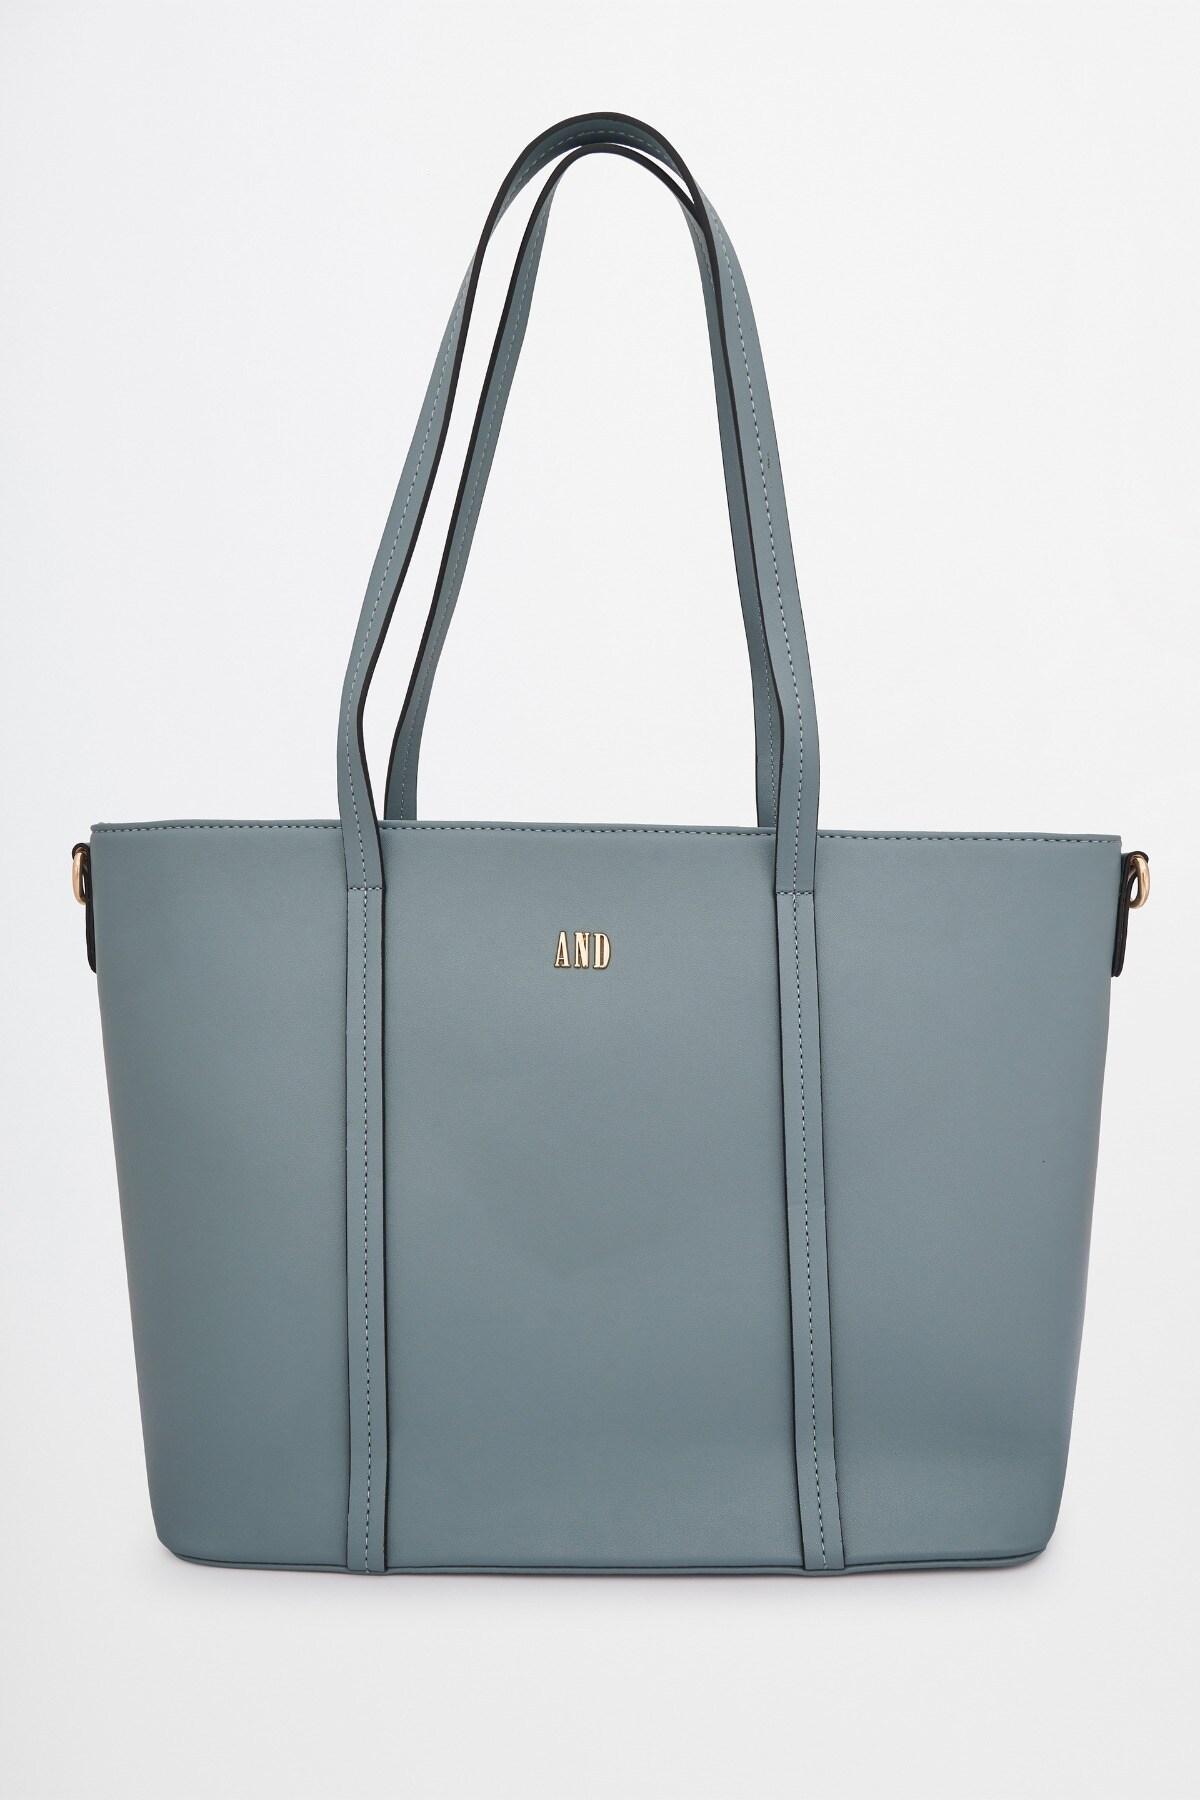 AND | Powder Blue Tote Handbag